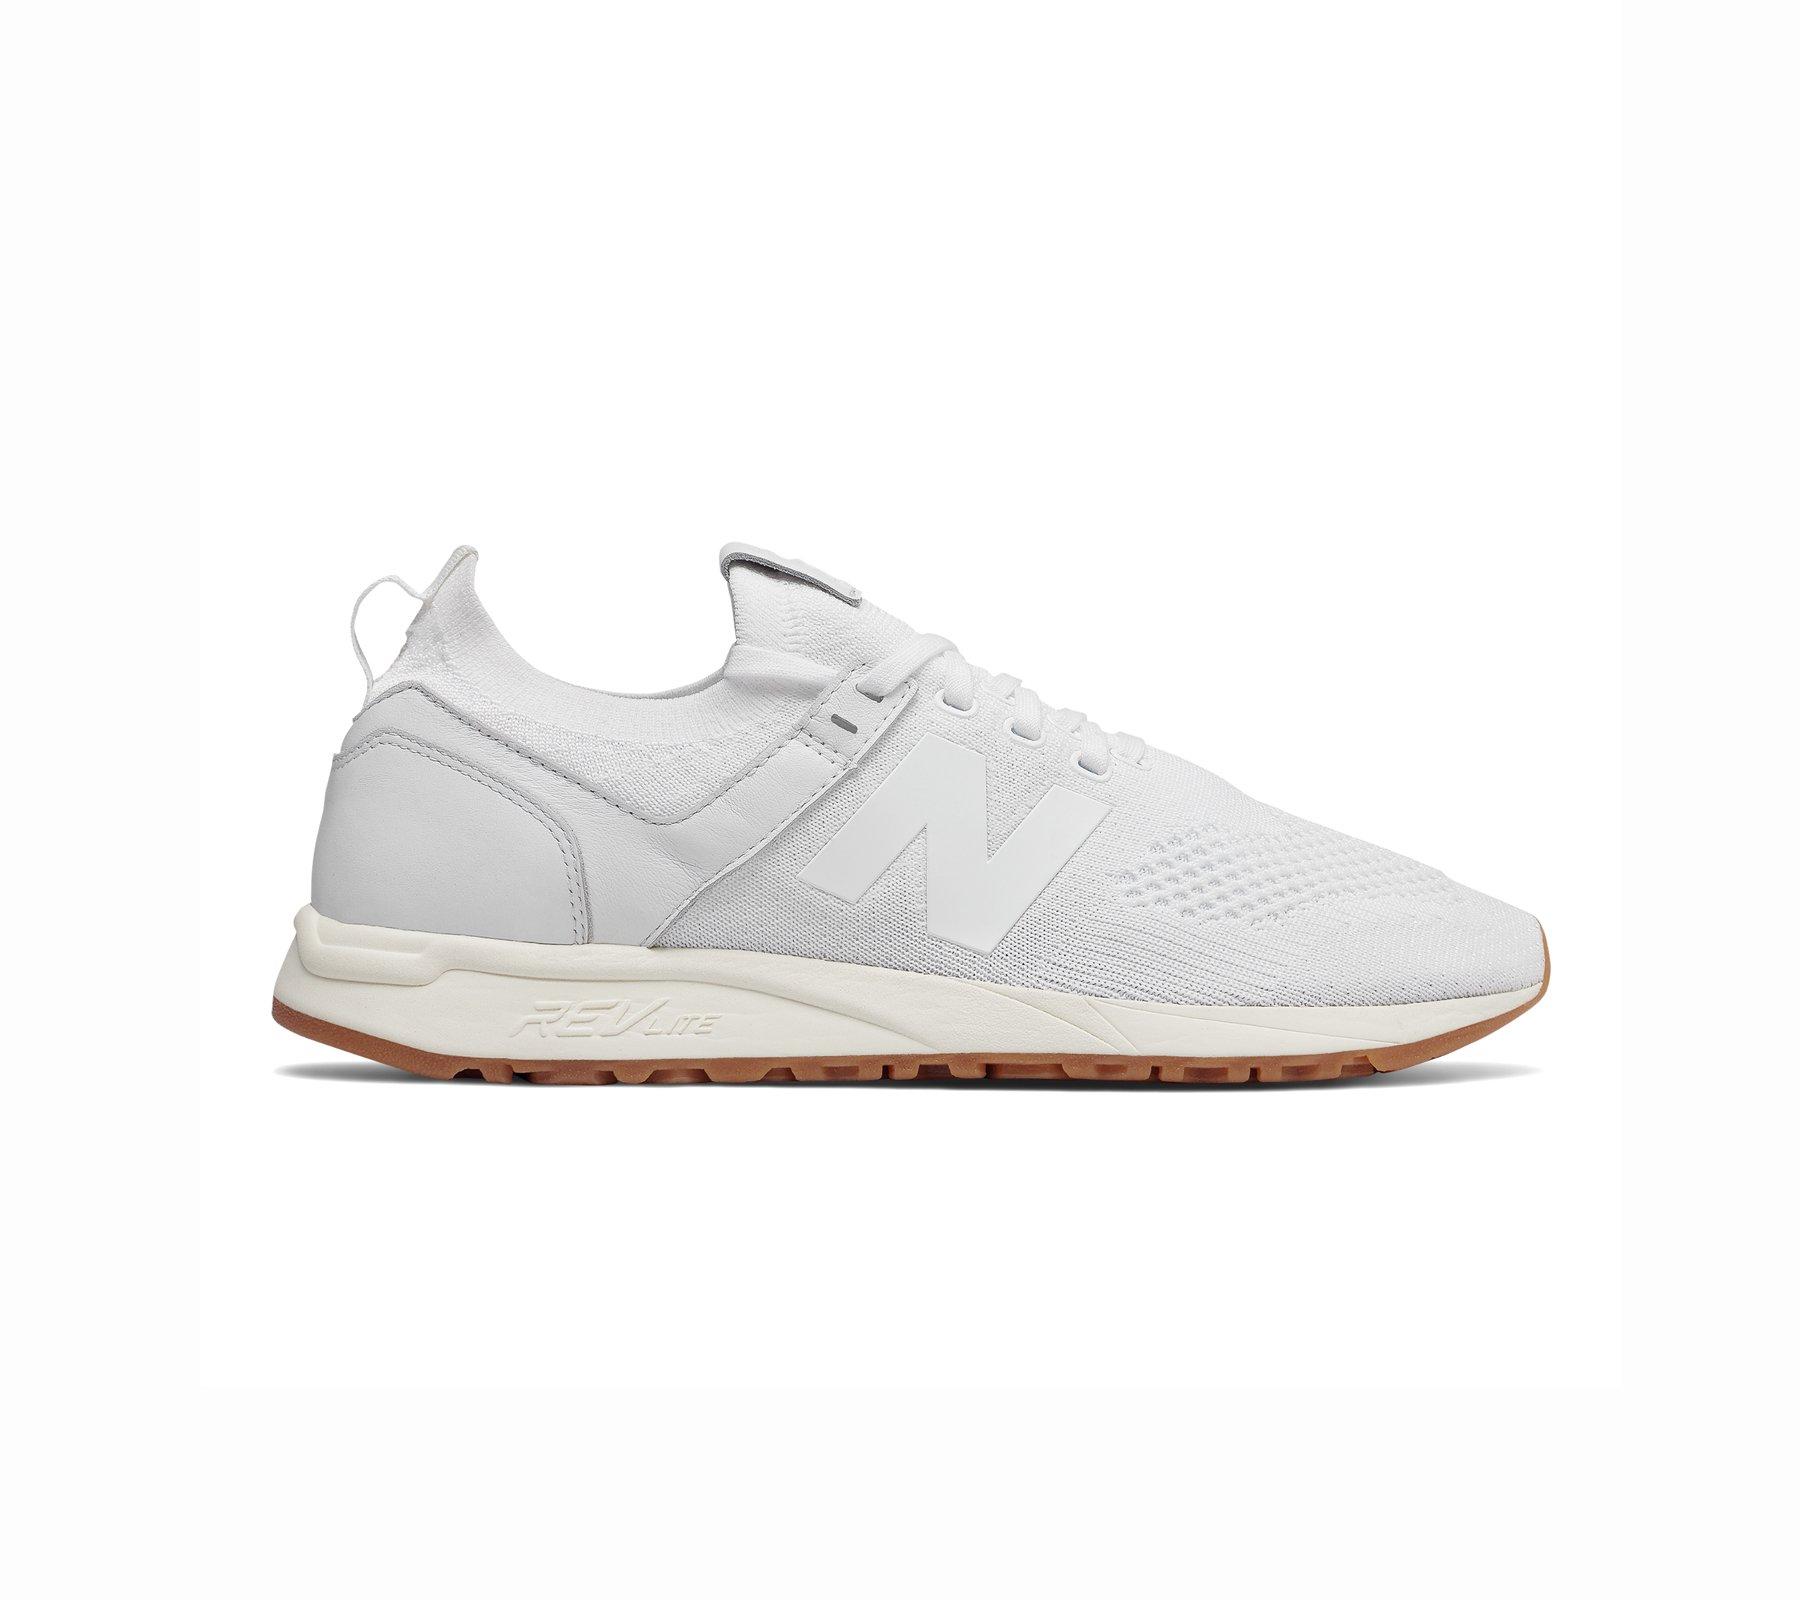 New Balance 247 Deconstructed sneaker - White/Gum